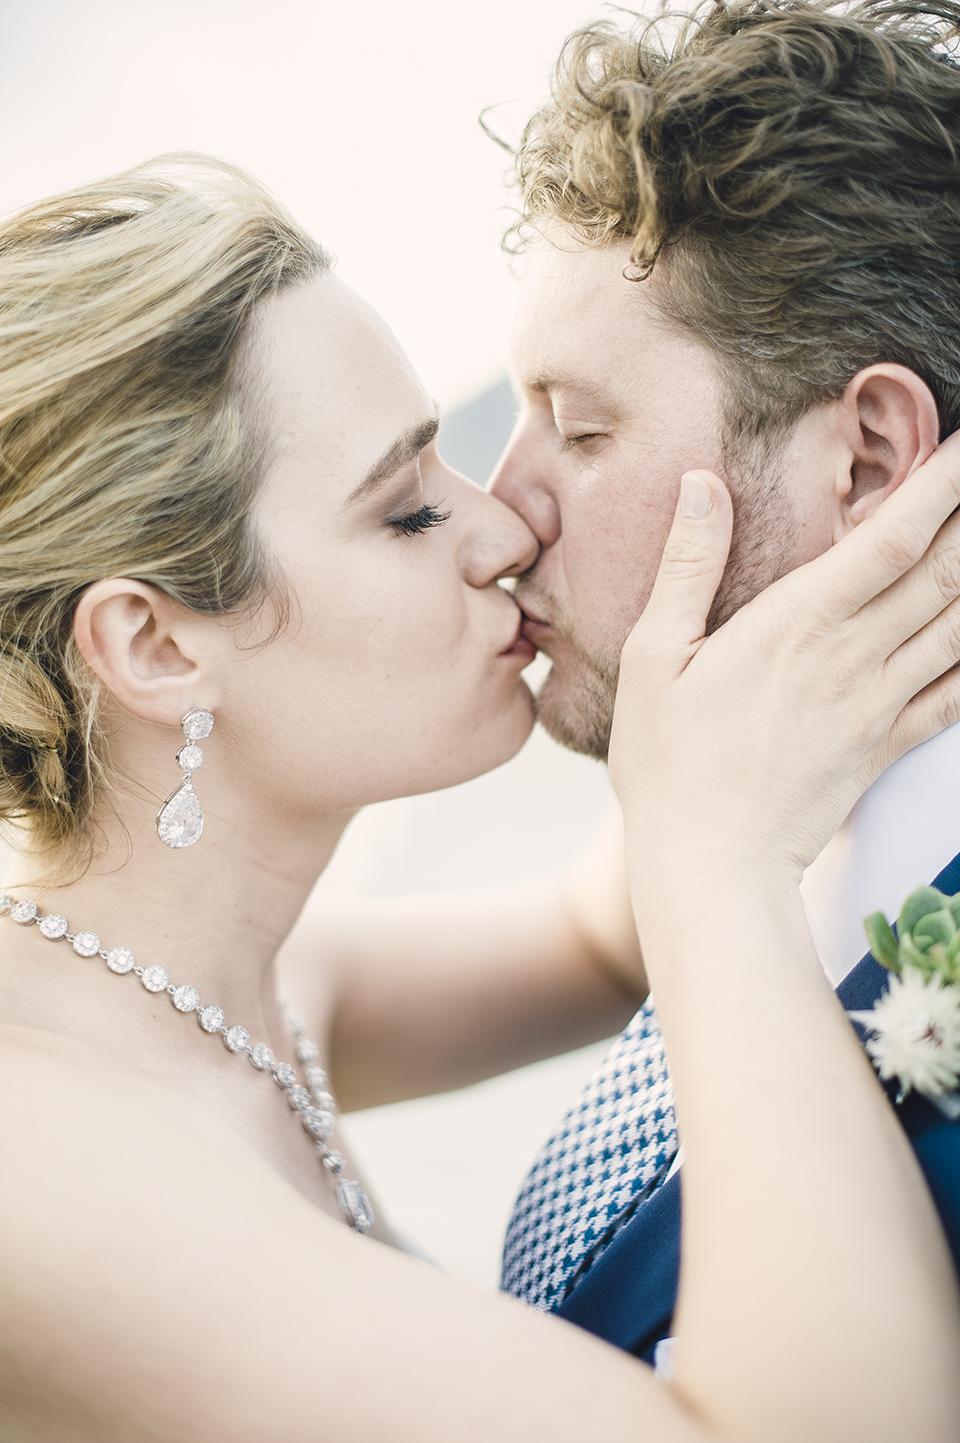 RyanParker_WeddingPhotographer_CapeTown_Hermanus_Stanford_Mosaic_Overberg_DSC_1104.jpg